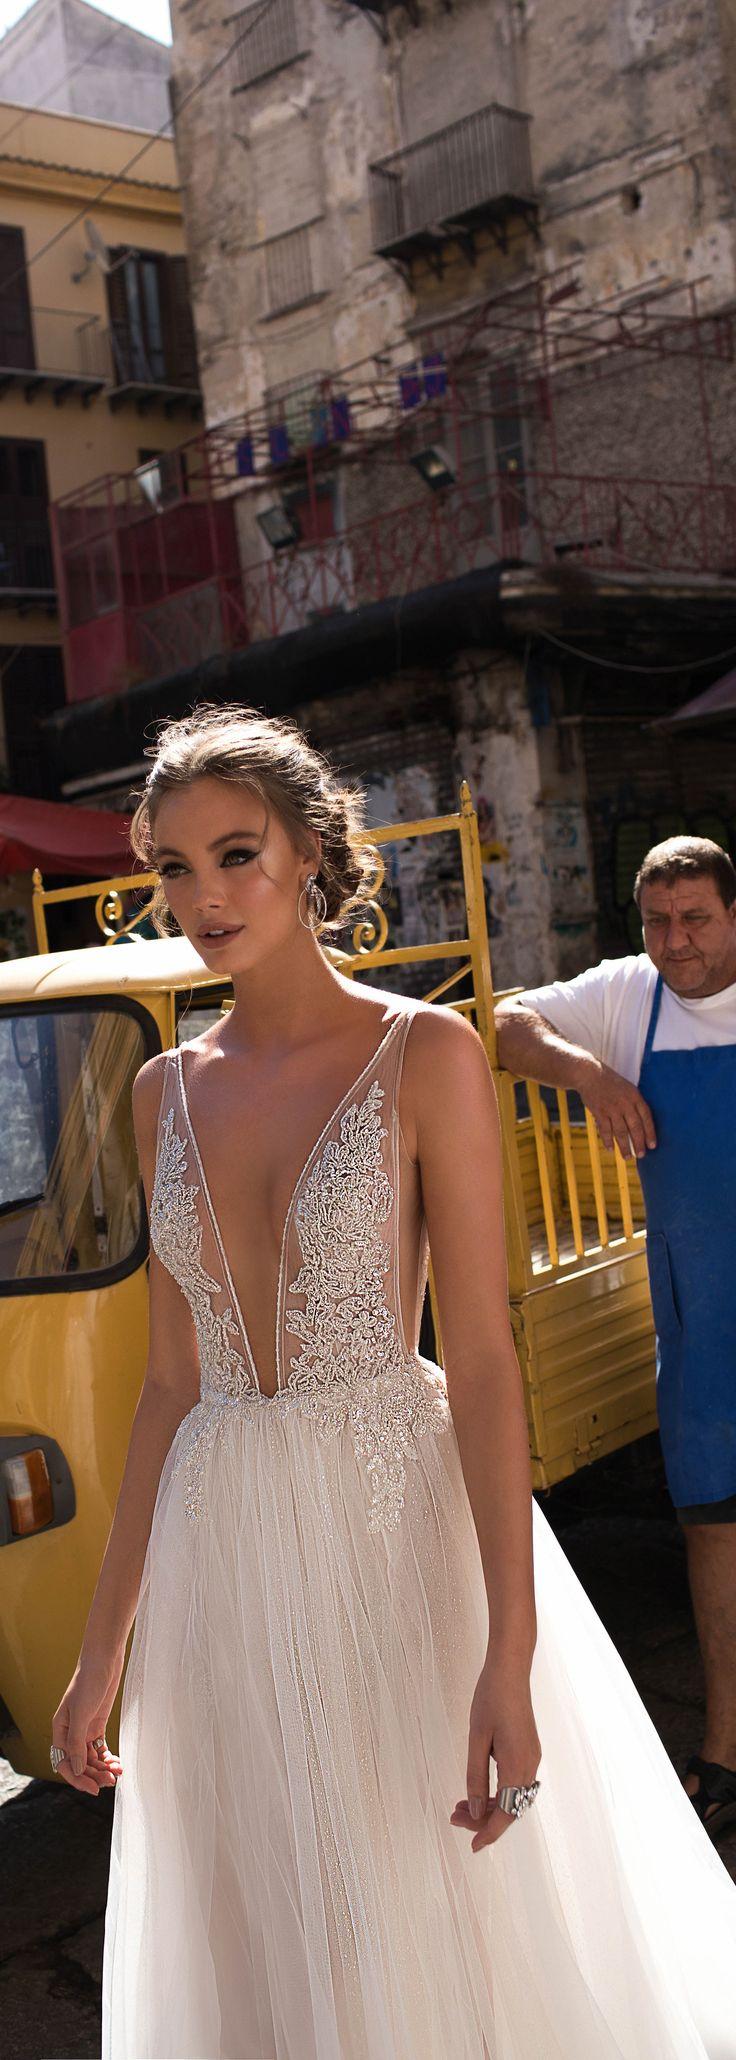 MUSE by Berta Sicily Wedding Dress Collection|#BERTA#WeddingDress#BridalGown#Bride